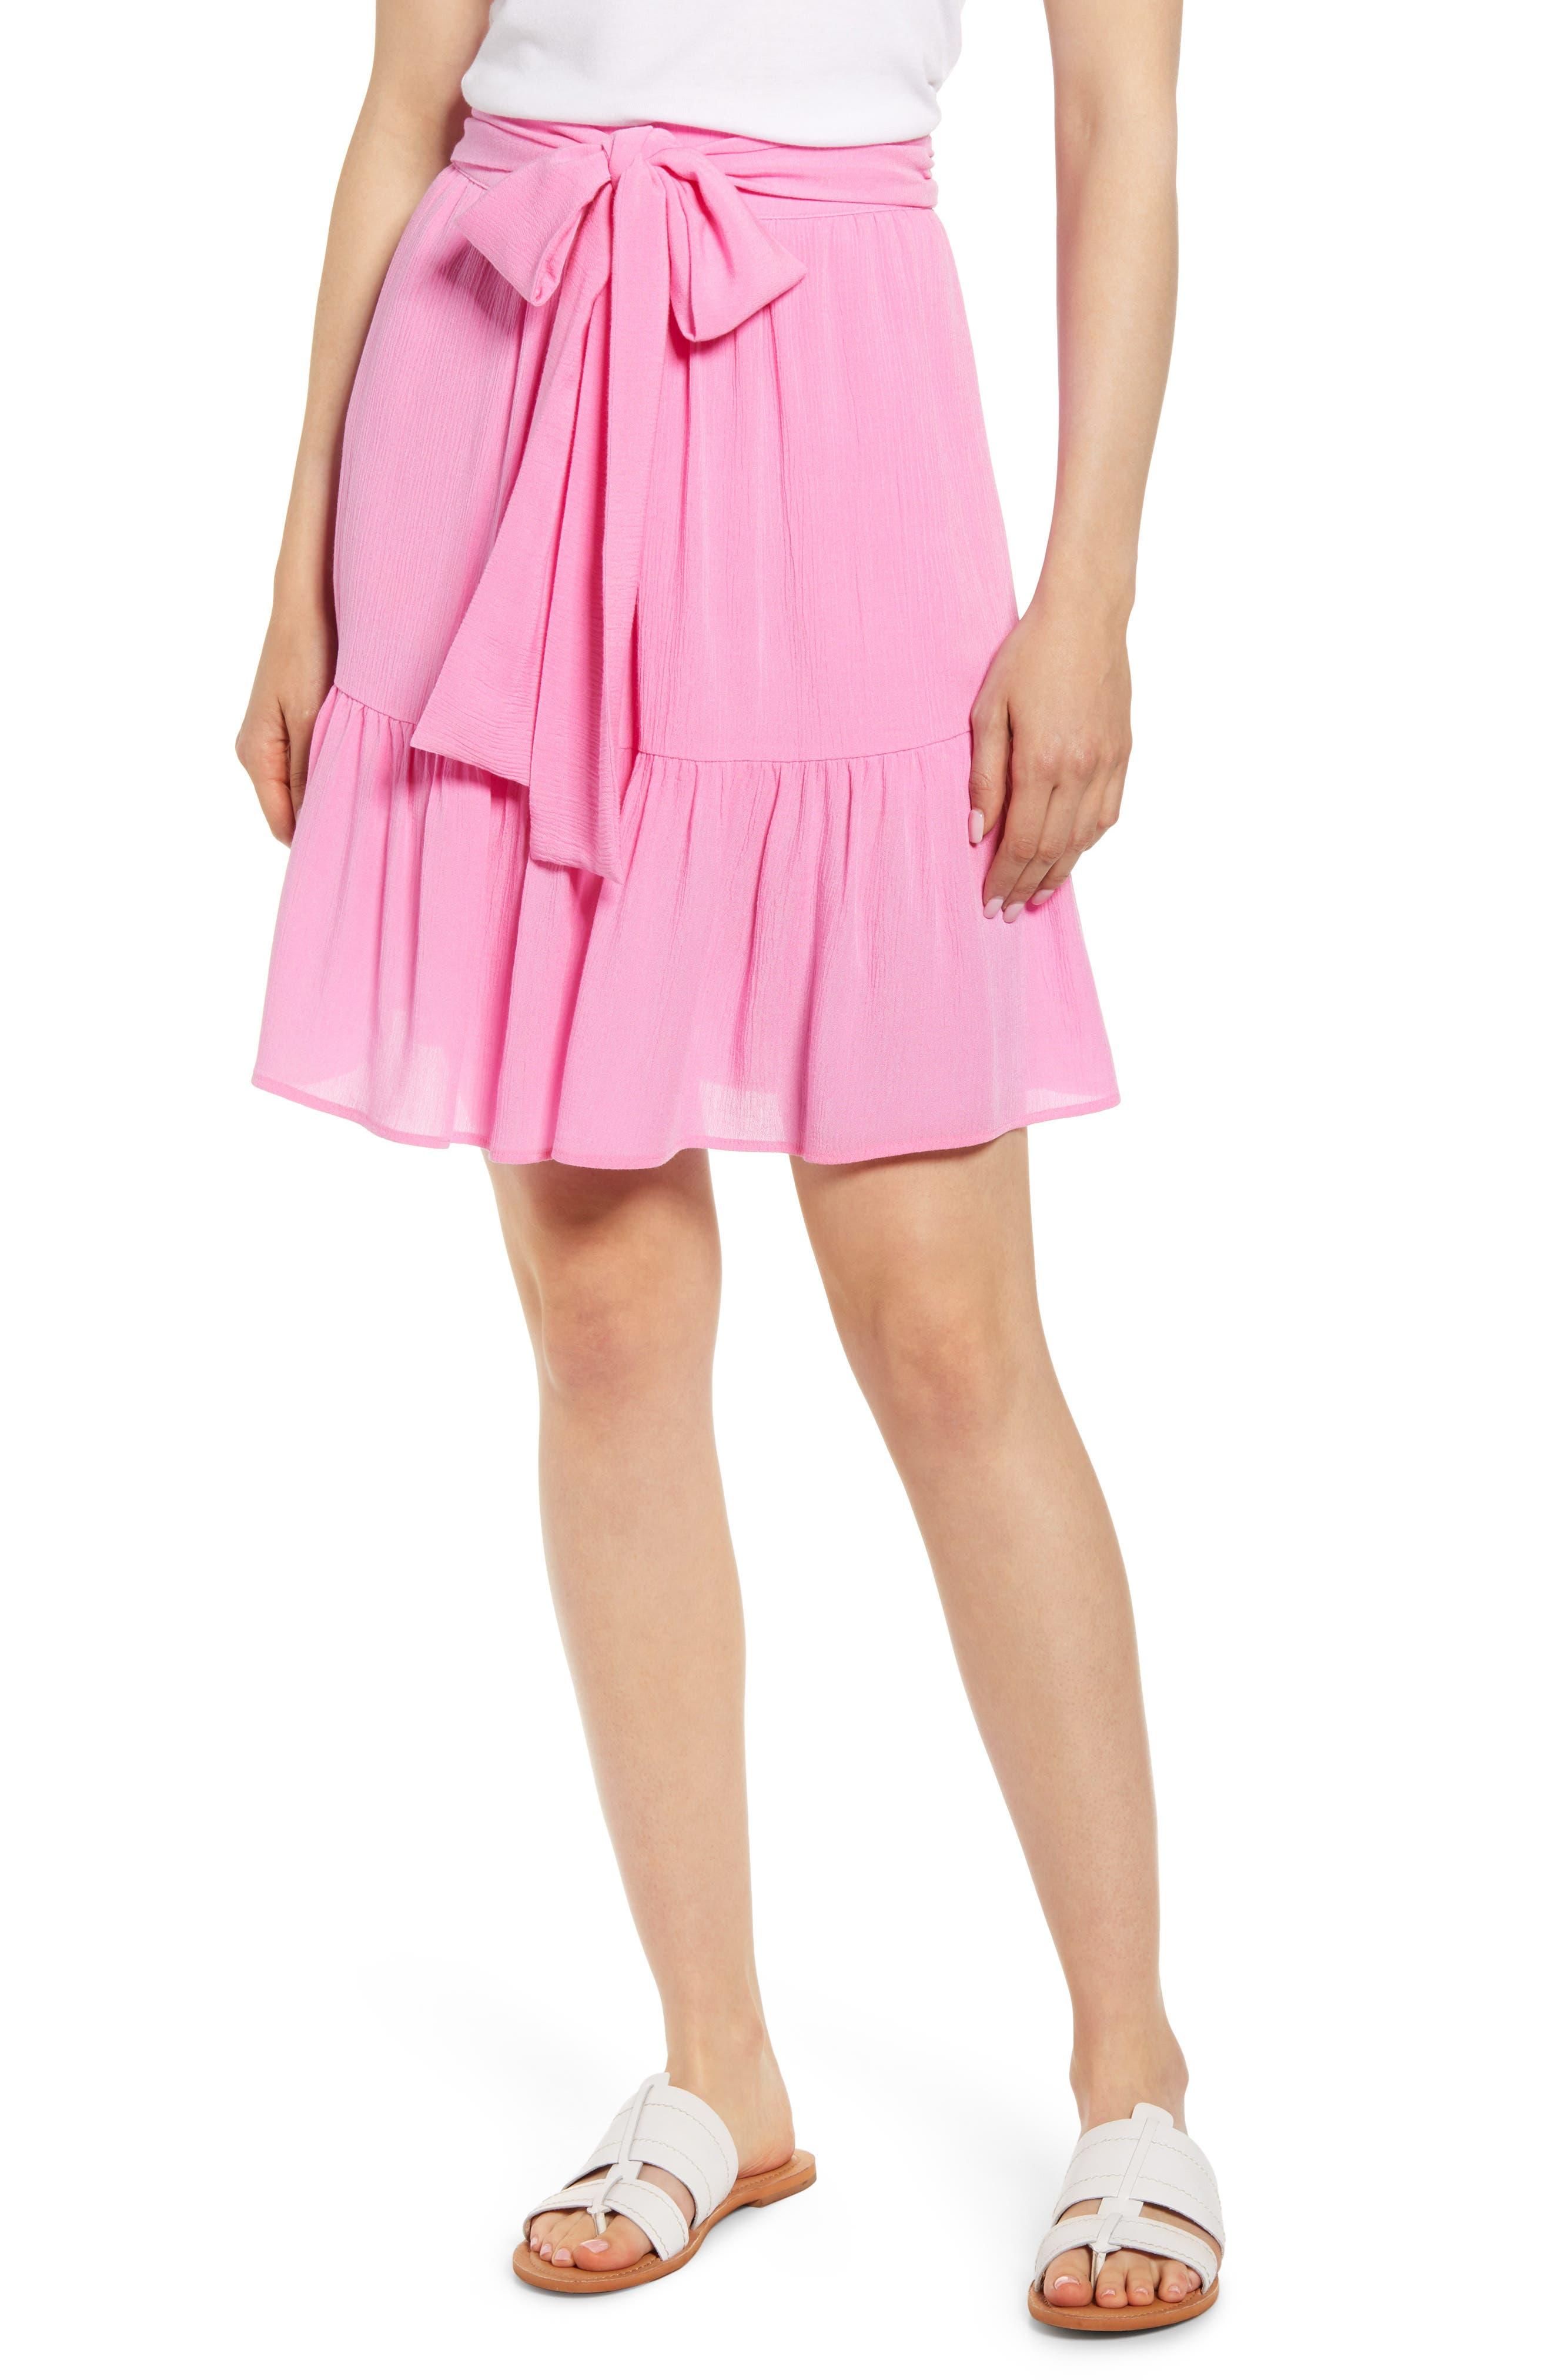 Petite Gibson X Hi Sugarplum! Capri Tiered Tie Front Summer Skirt, Pink